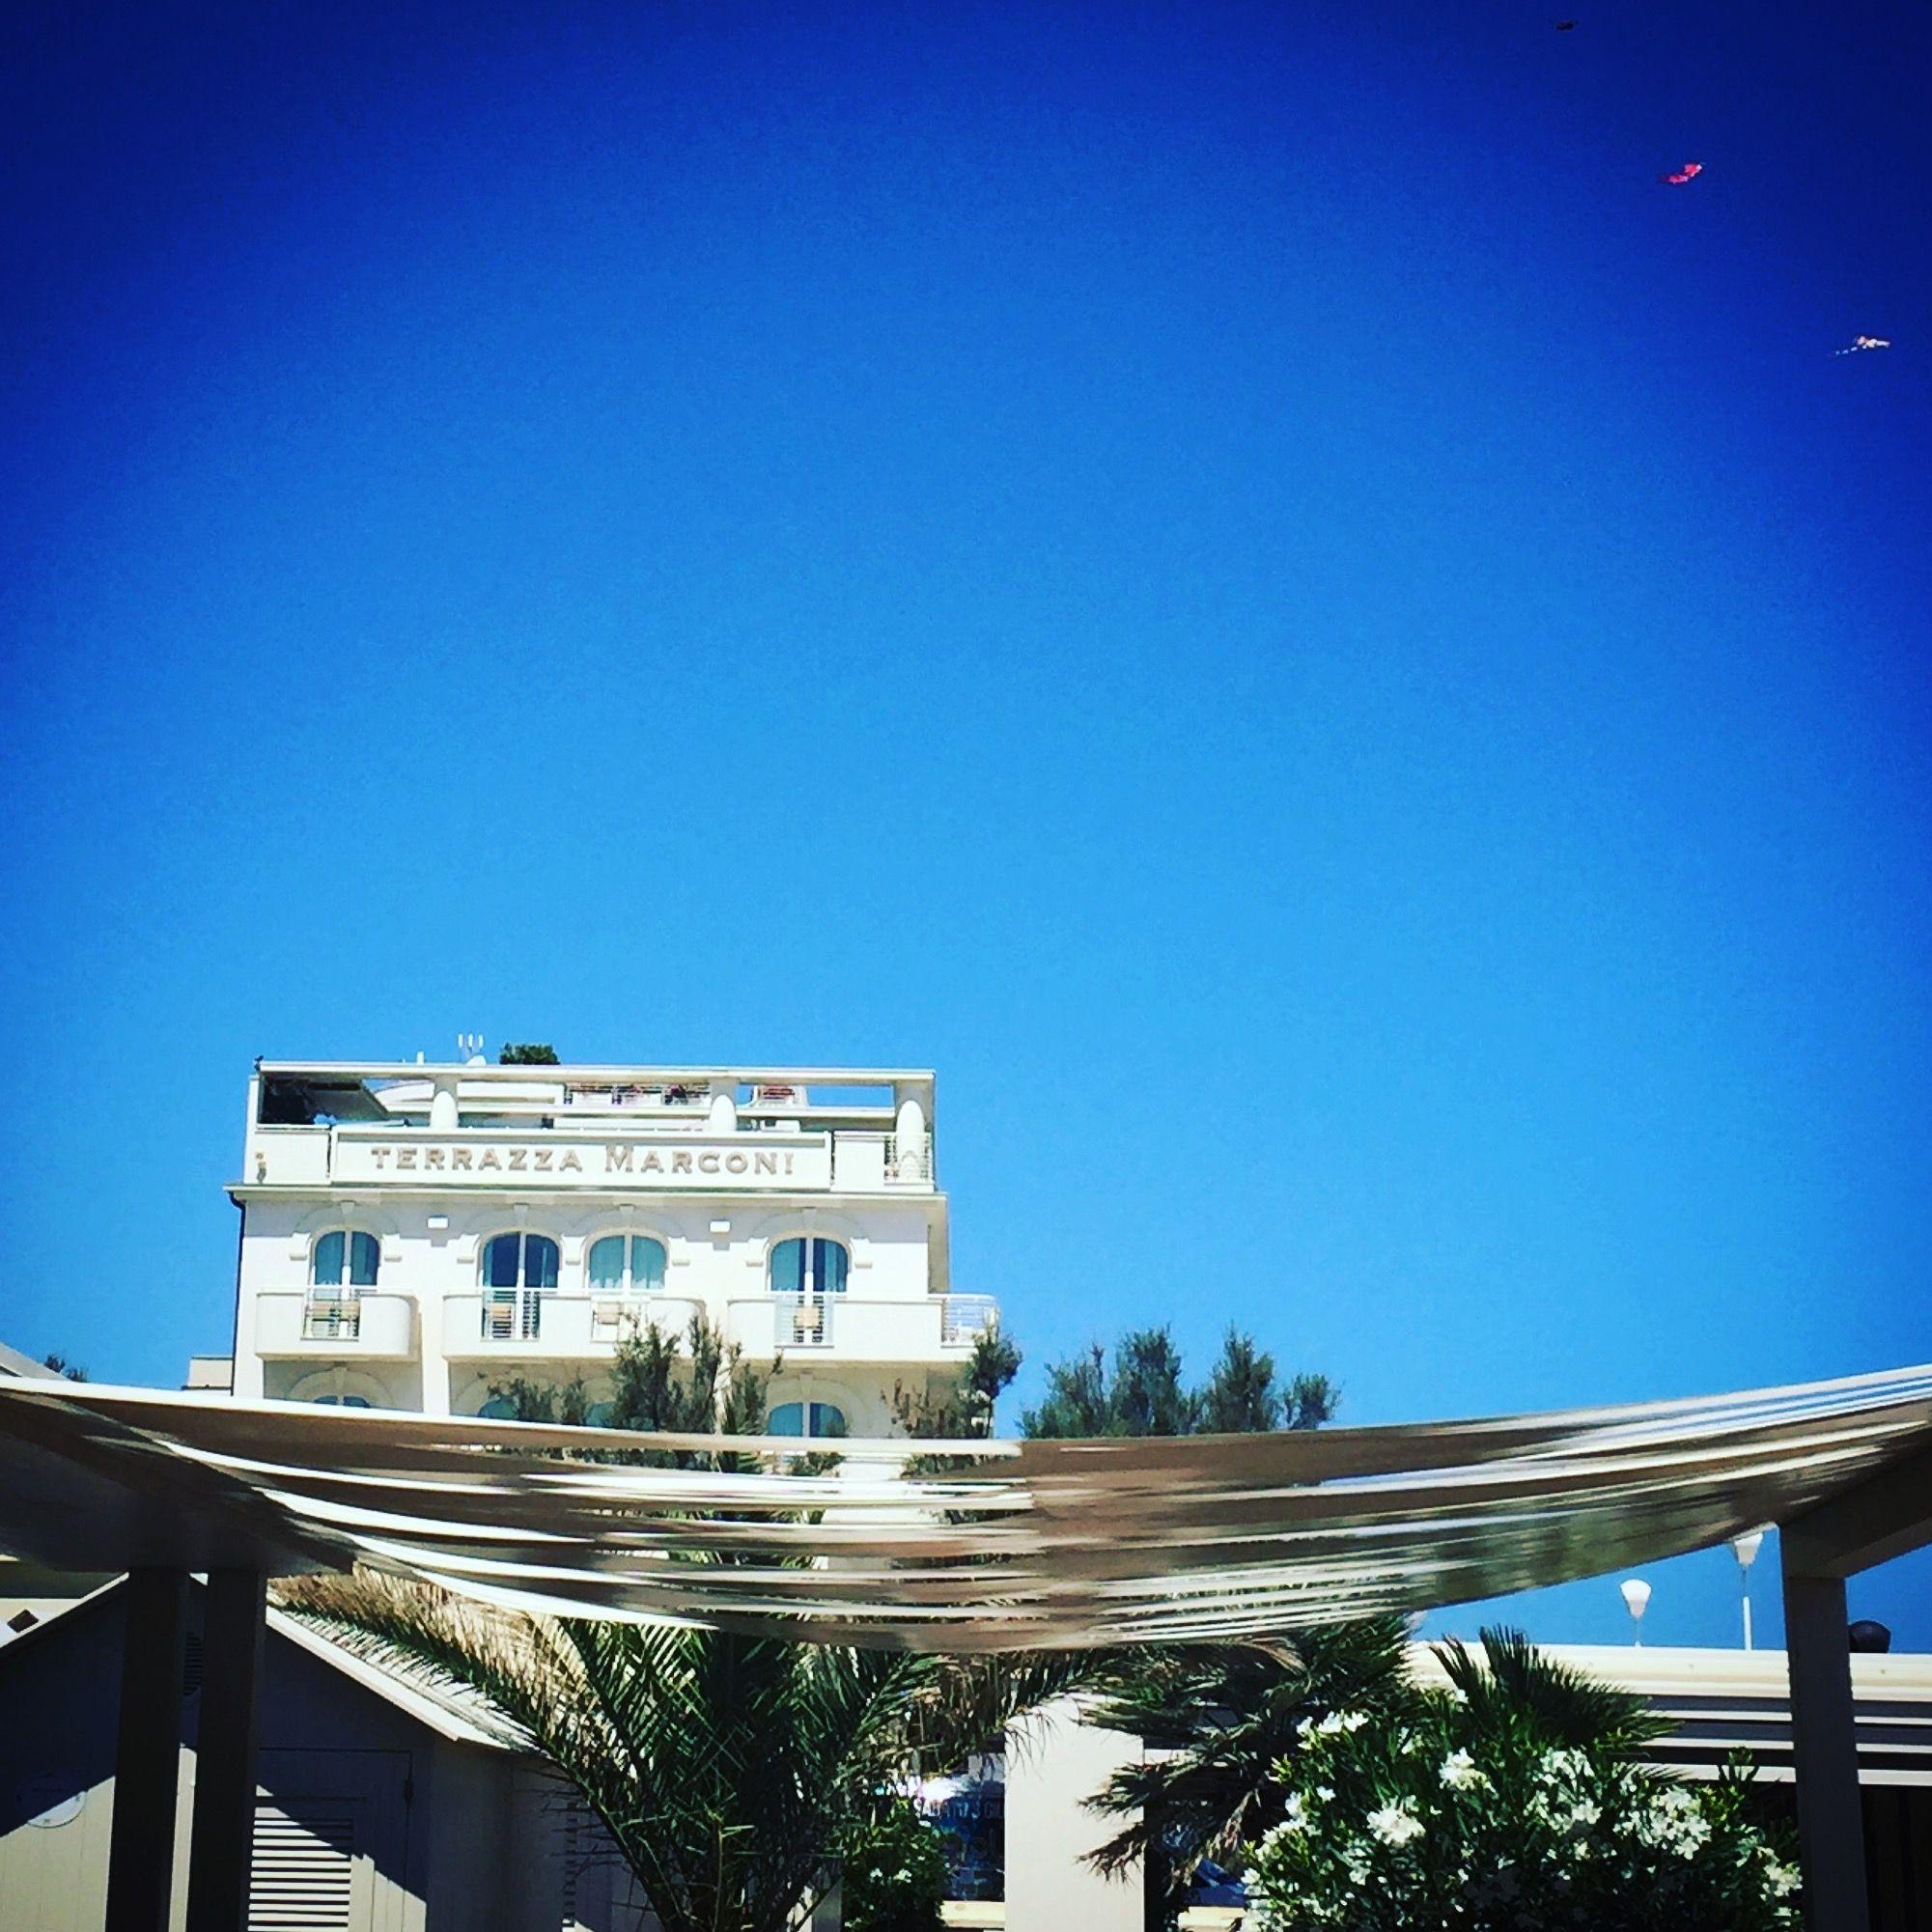 Pin by Hotel Terrazza Marconi Hotel&SpaMarine on TERRAZZA MARCONI ...